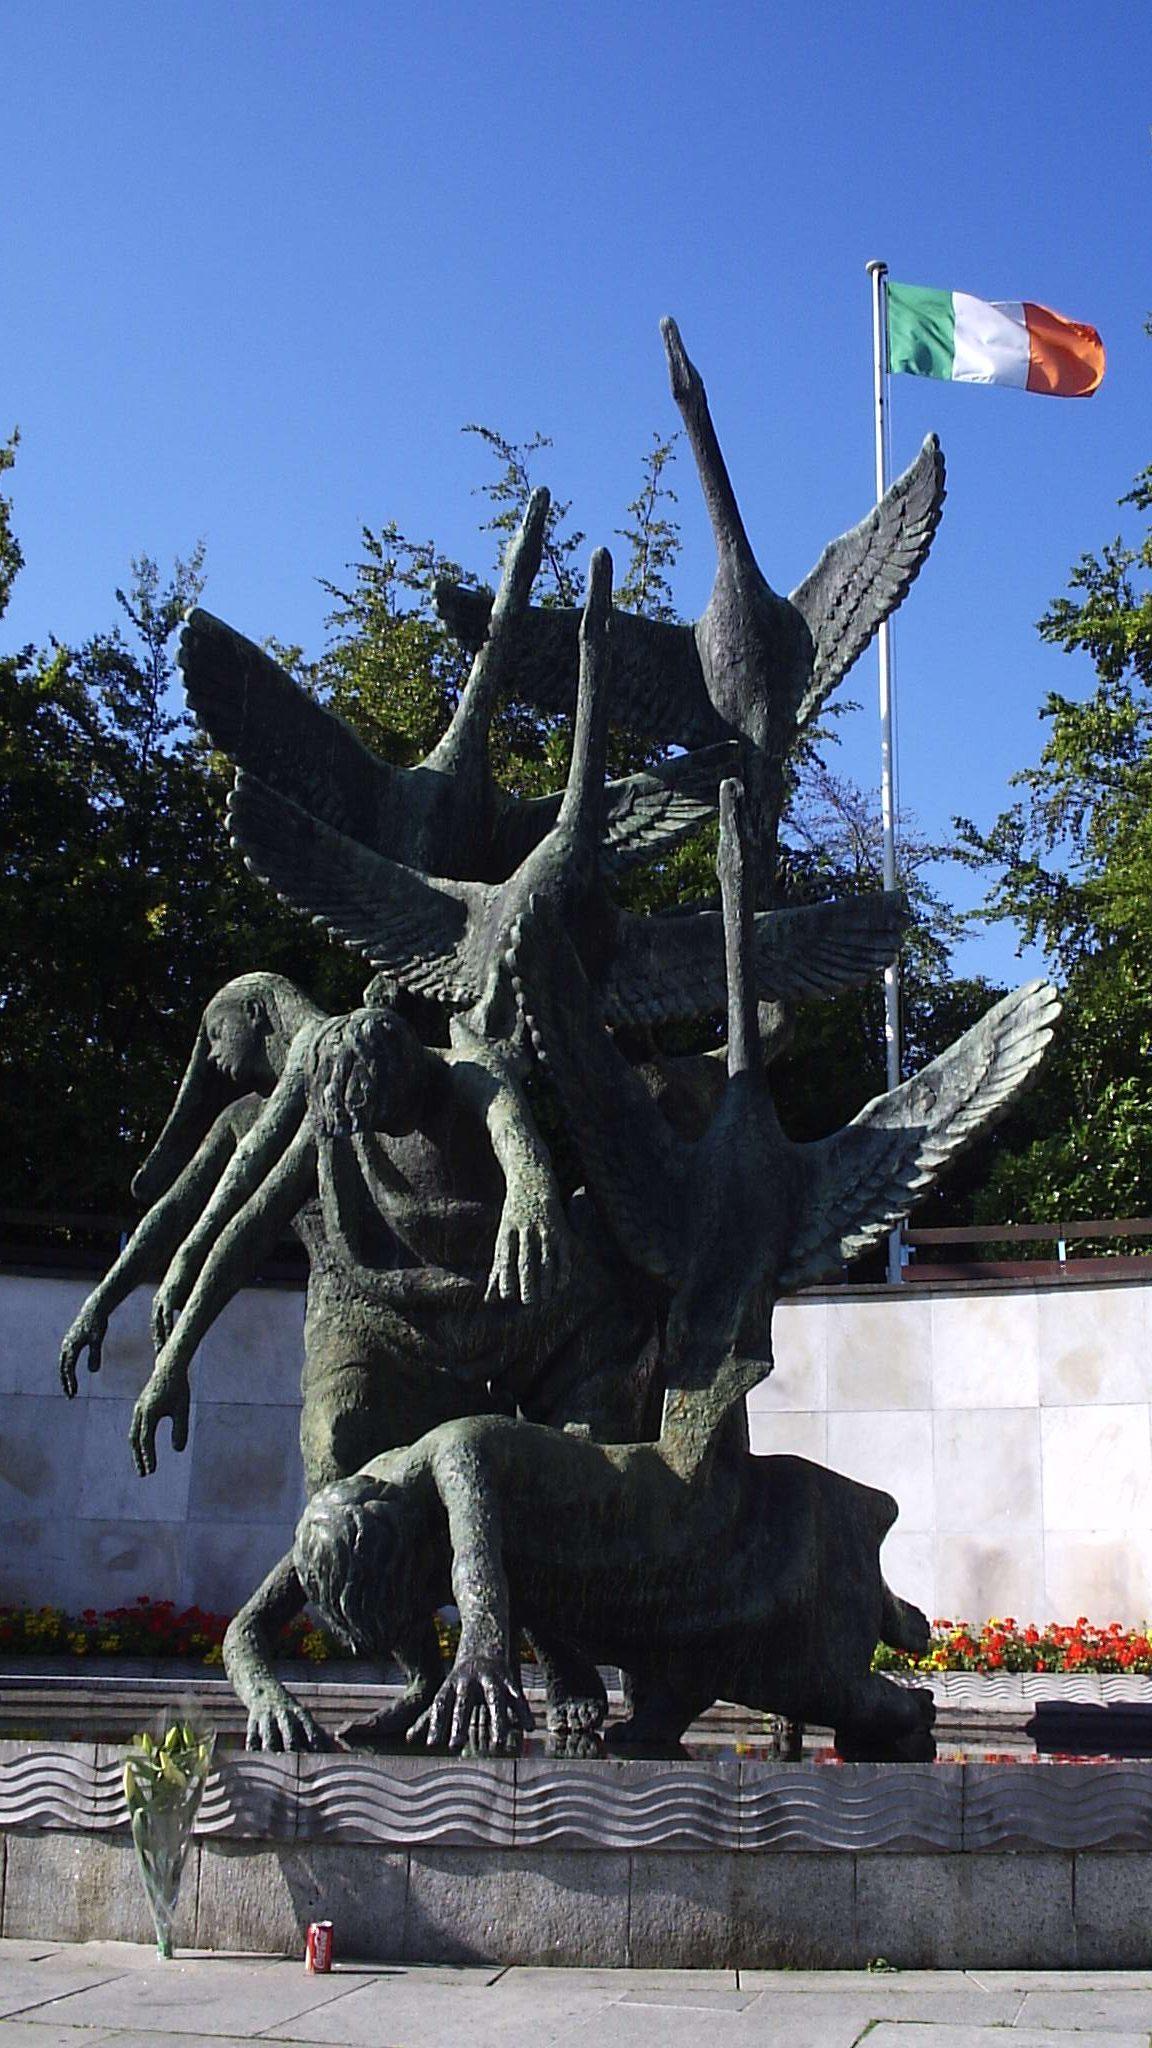 Sculpture in Garden of Remembrance in Dublin. It is called Children of Lir. Author: Sebb. Public domain.